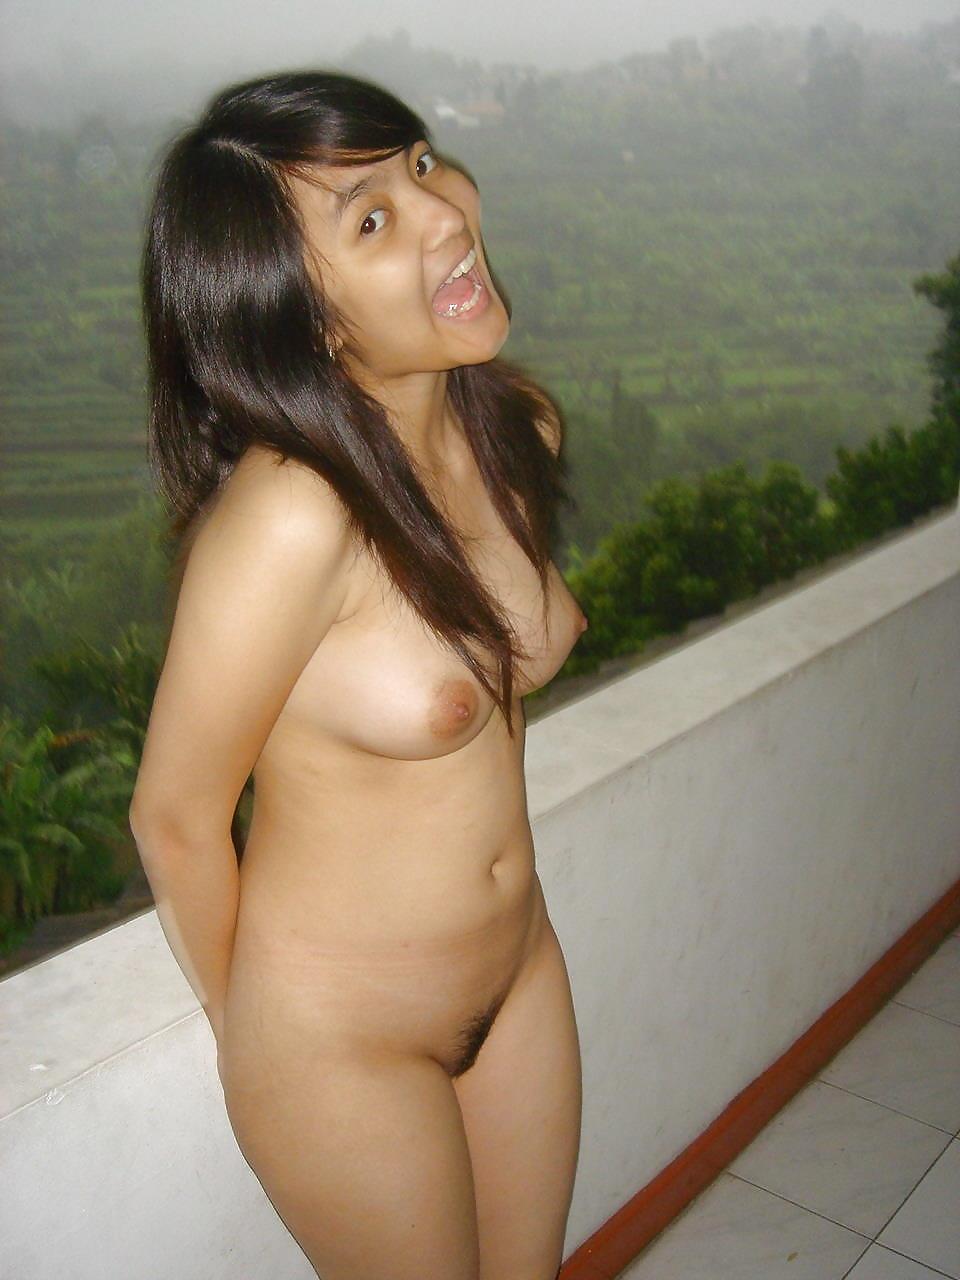 Nepali Girl Hairy Pussy Photo